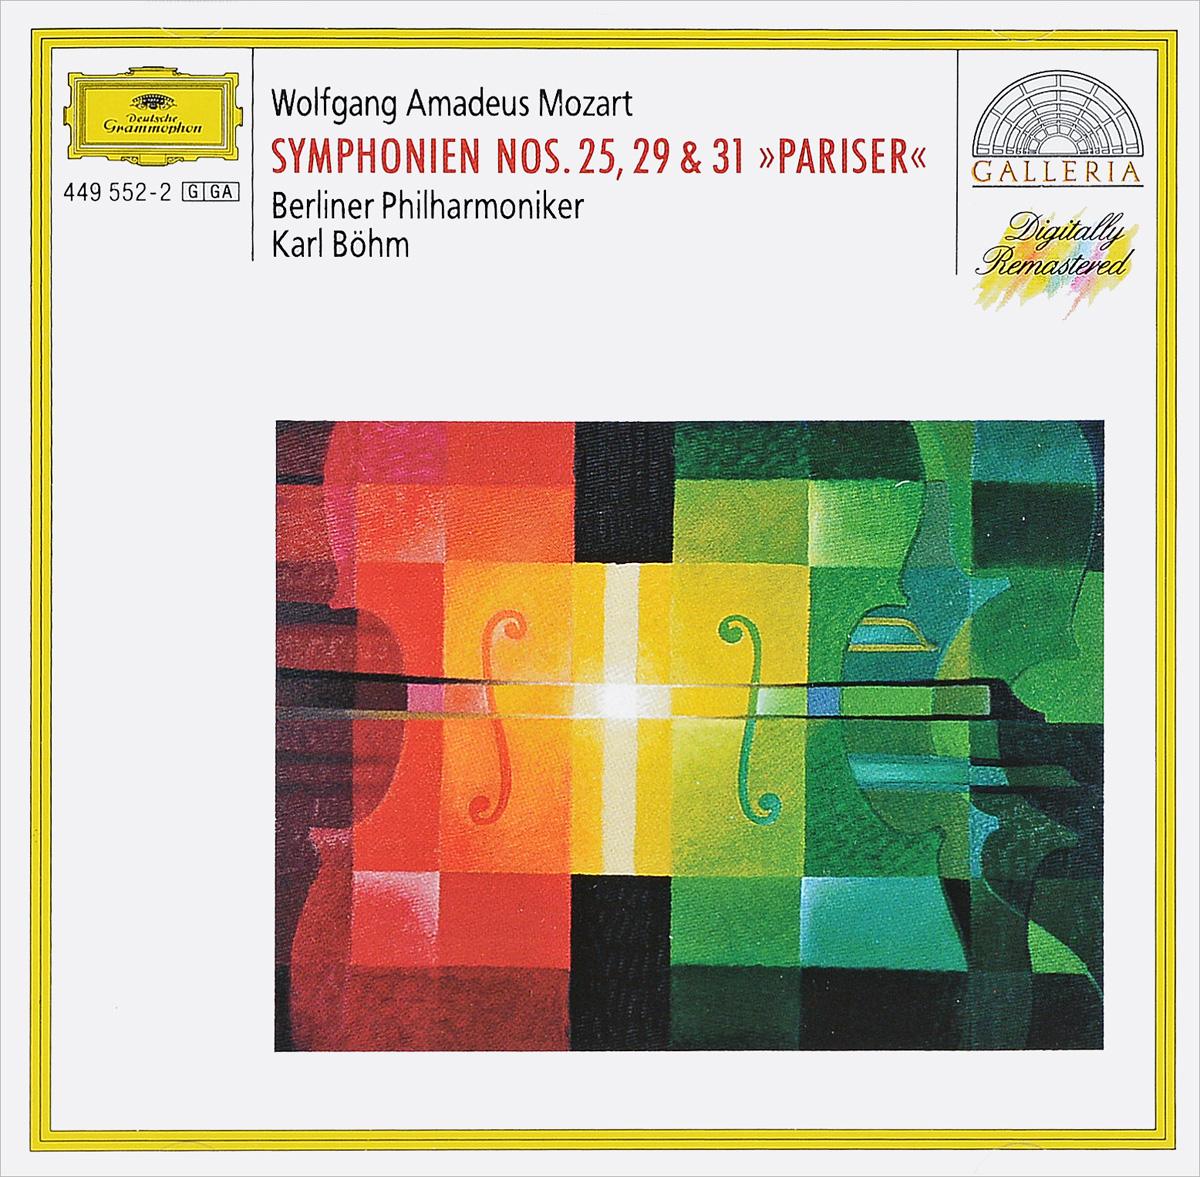 Карл Боэм Karl Boehm. Mozart: Symphonies Nos.25, 29 & 31 münchner philharmoniker elbphilharmonie hamburg